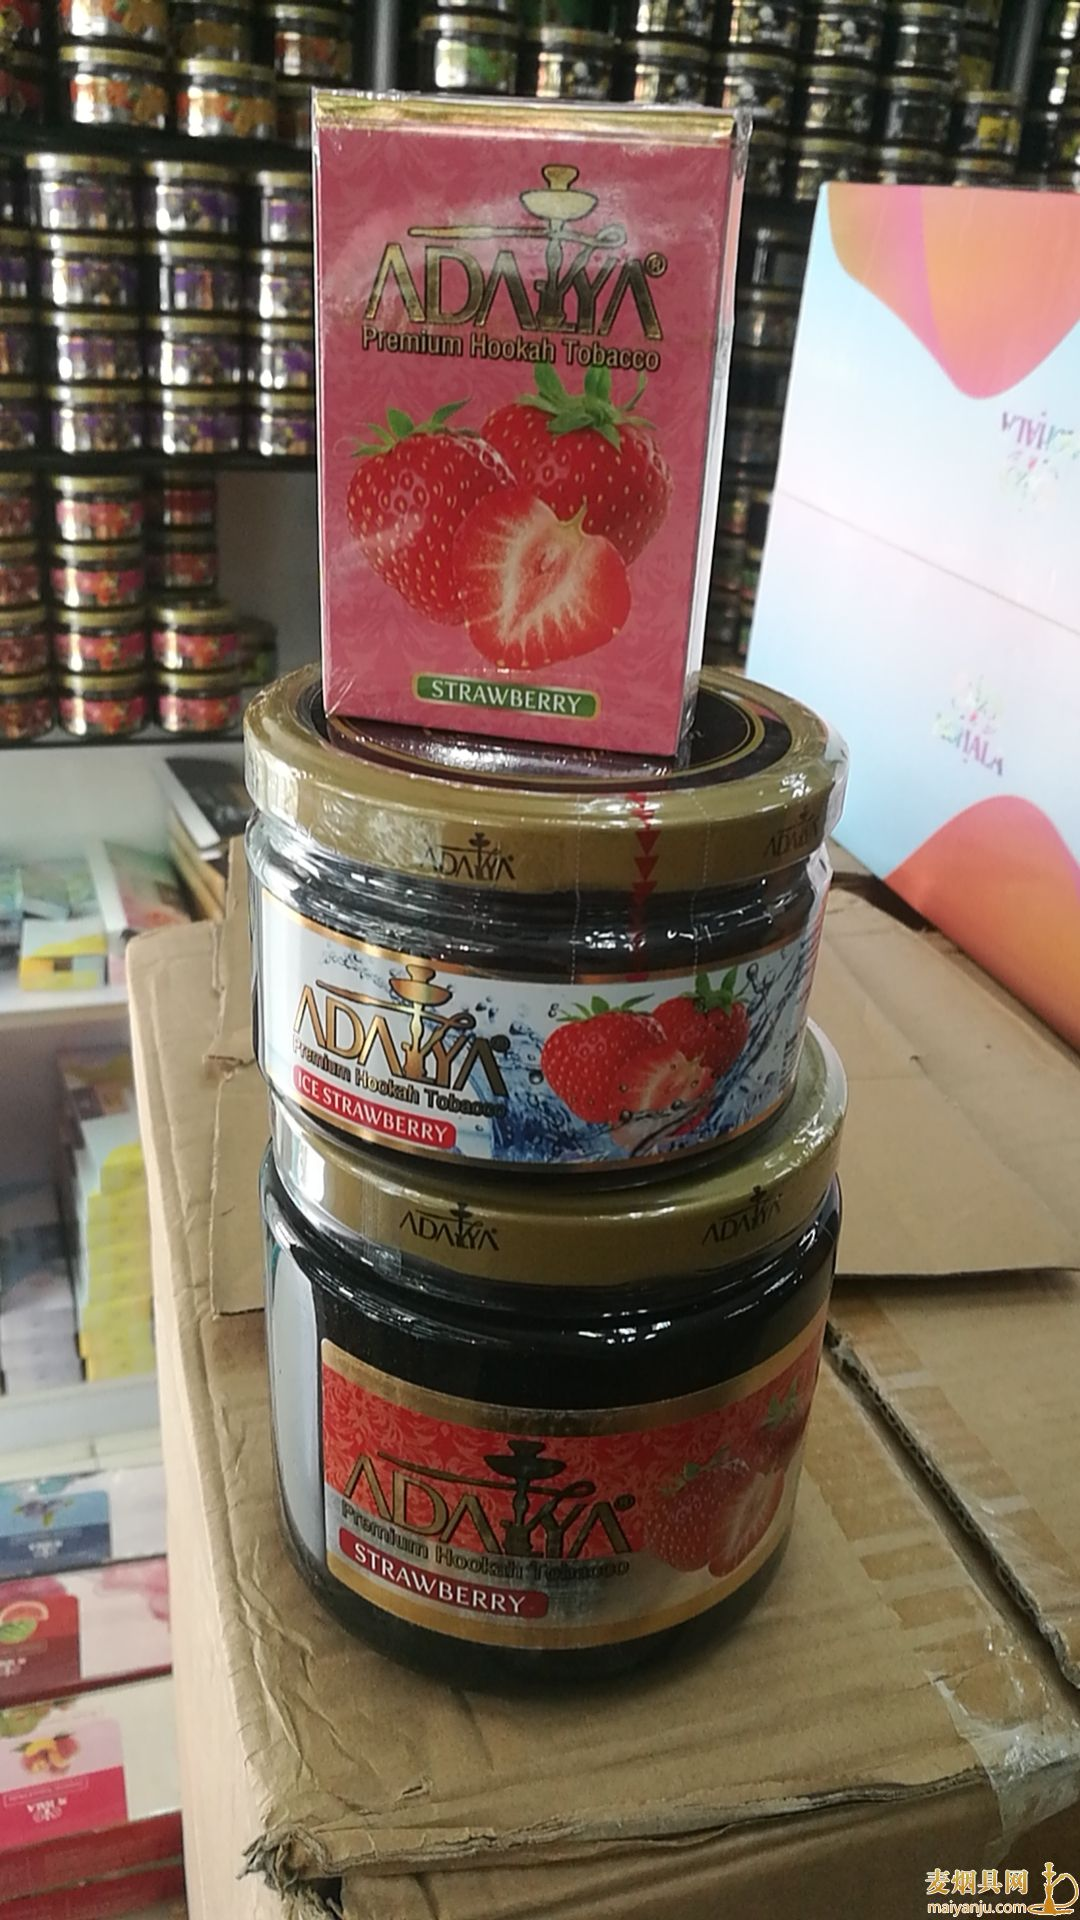 ADALYA阿戴雅草莓口味50克草莓1千克草莓250g冰草莓图片